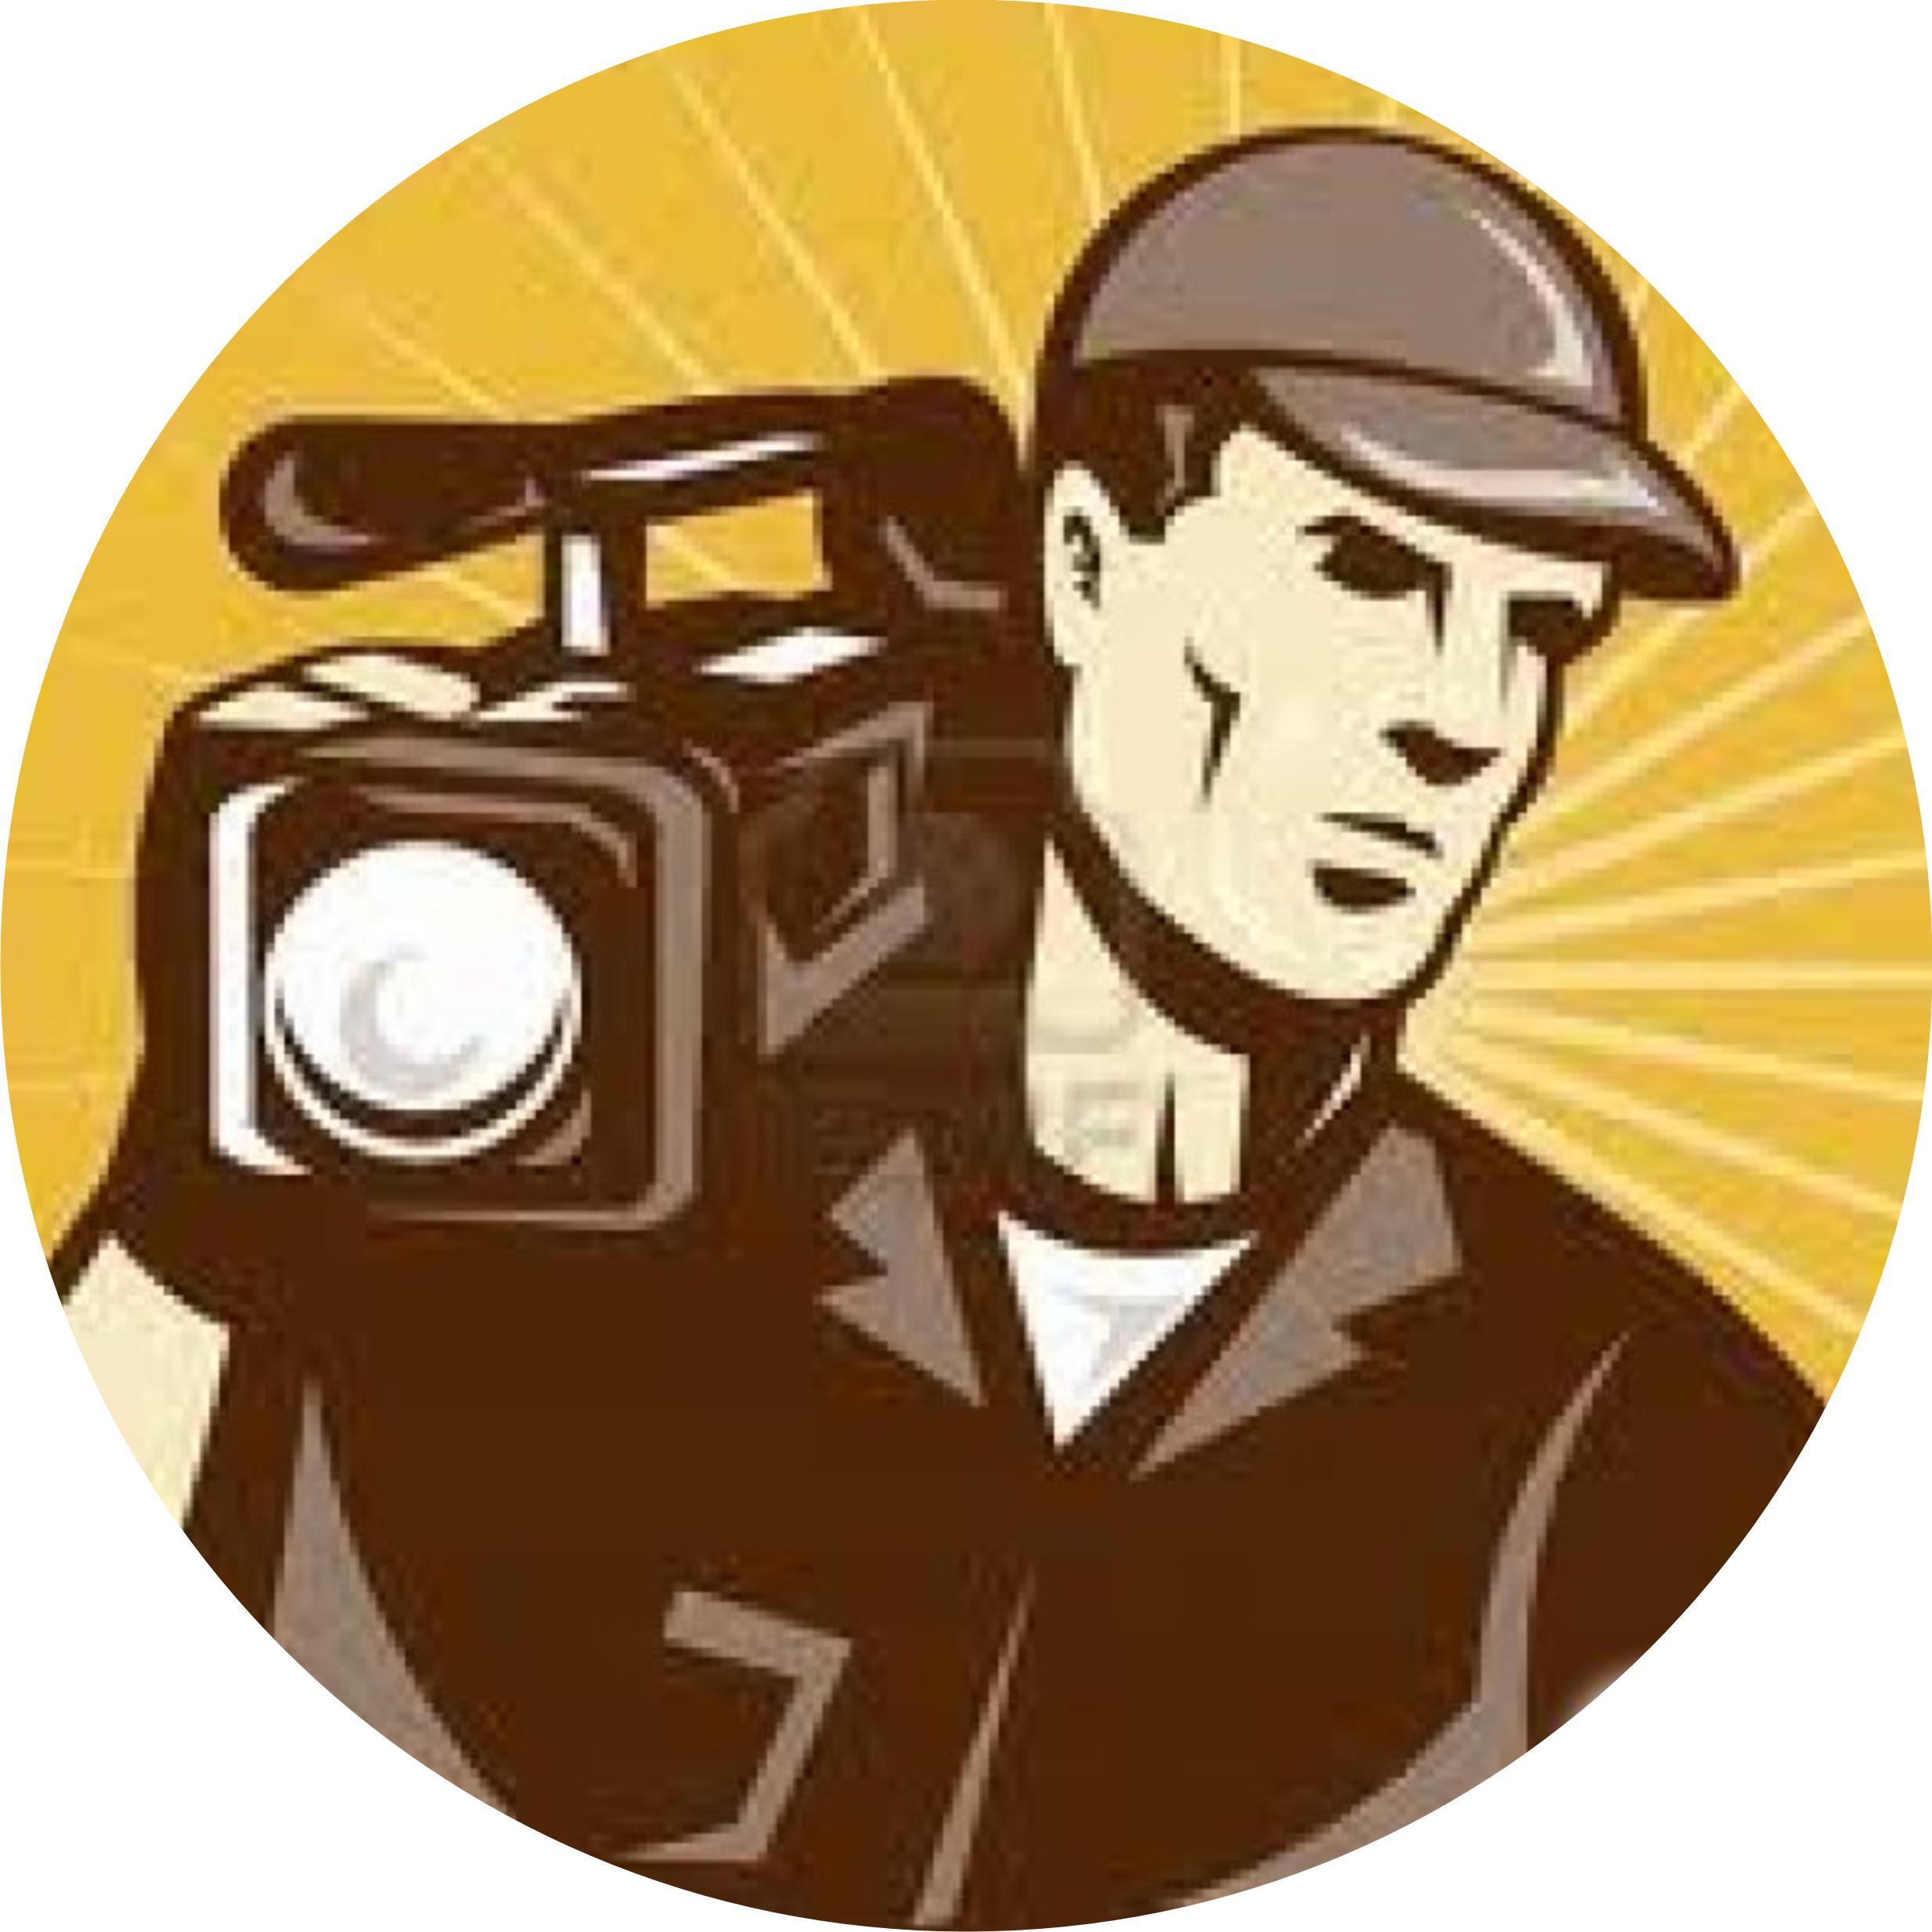 Video clipart video shooting. Memahami terbaik untuk pemula